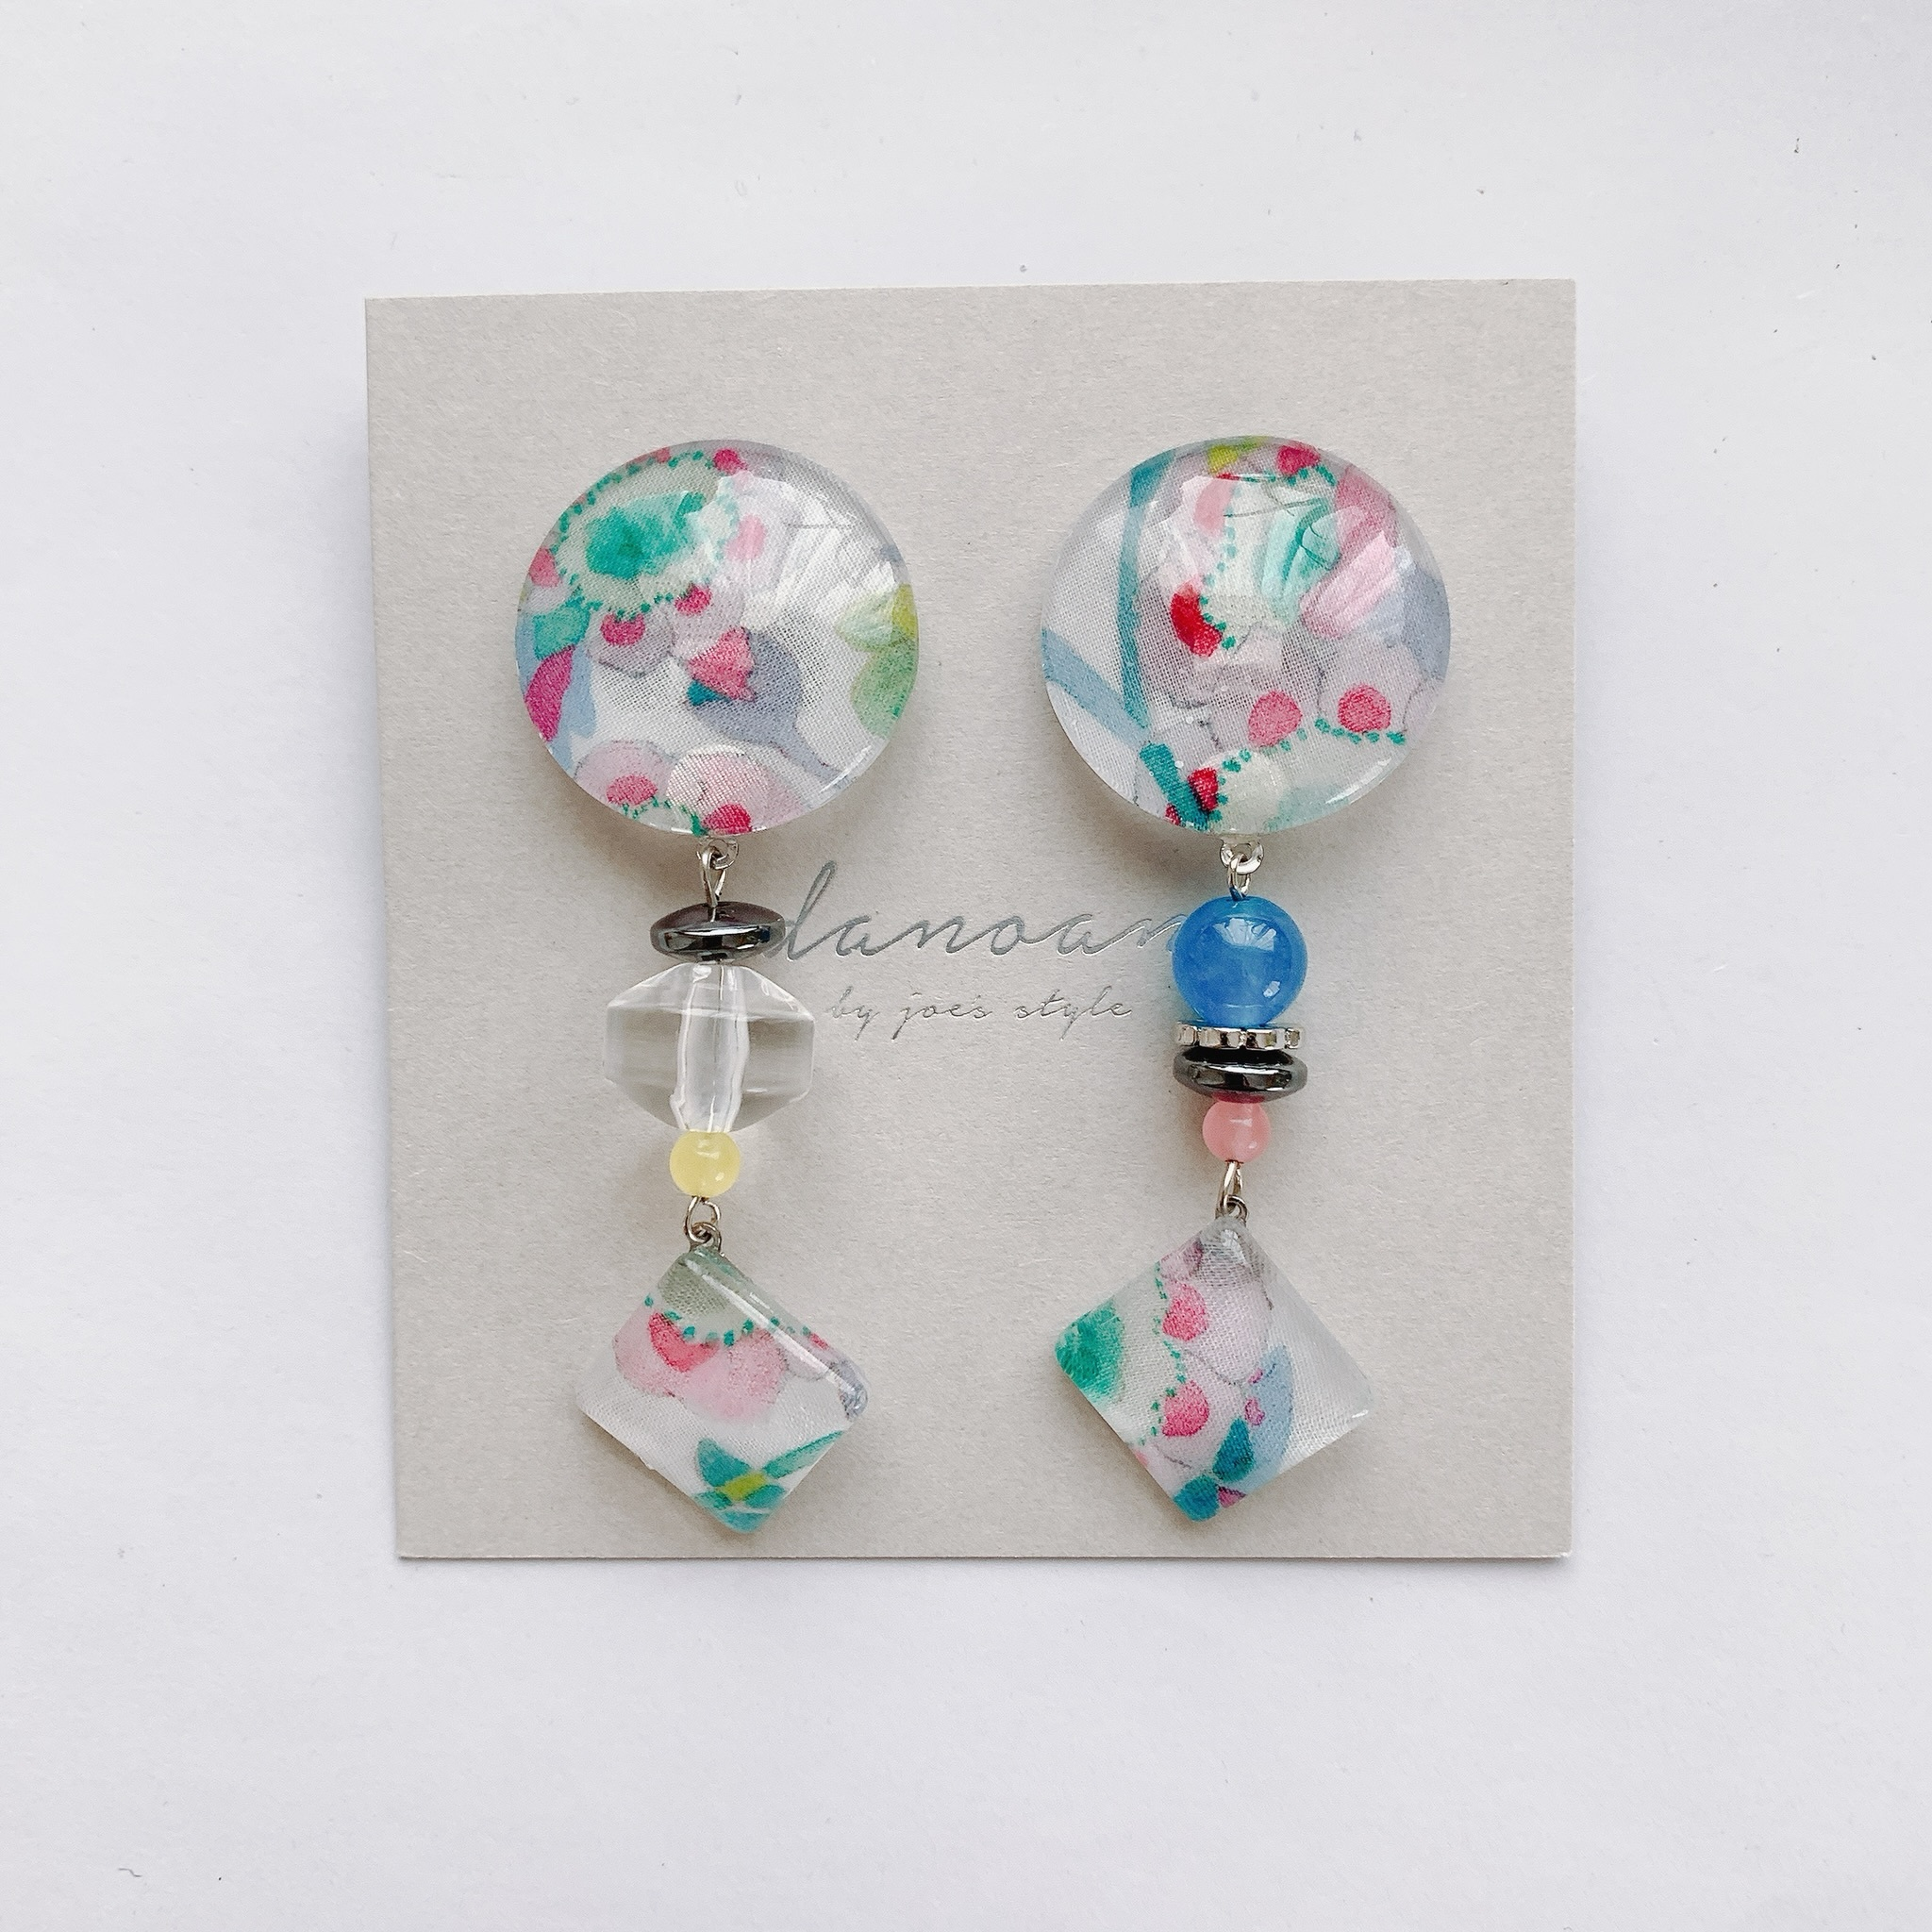 """ Earrings NO.danoan-6″リバティ×天然石"